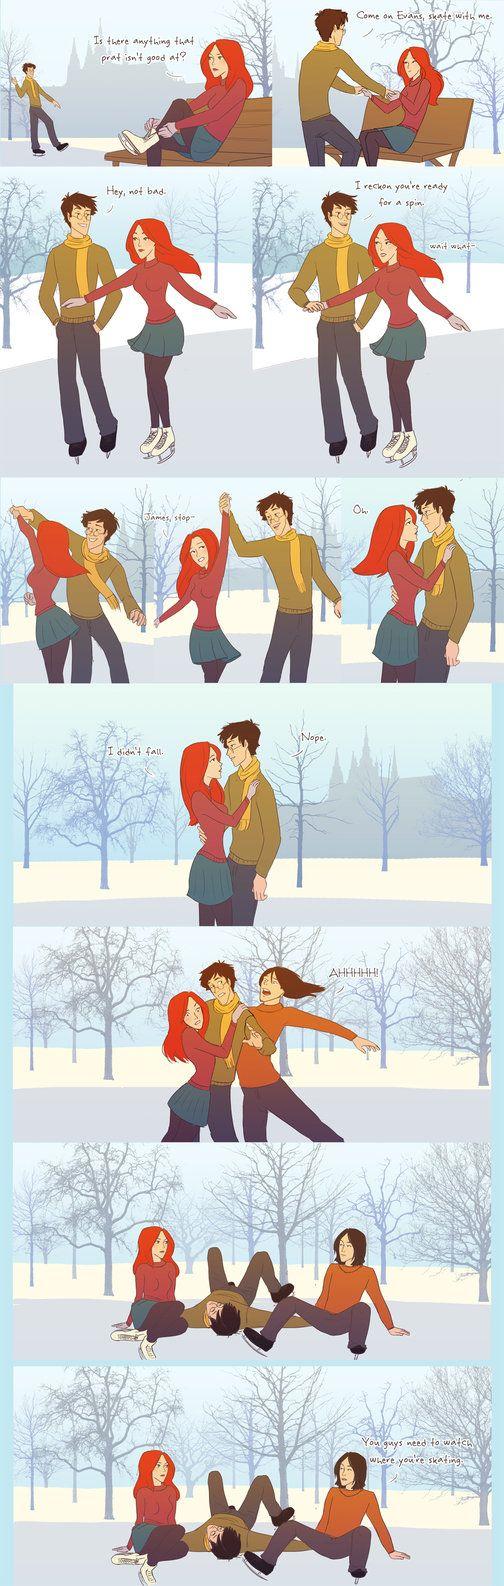 Skating by =julvett on deviantART kmg in love it!! Haha and Sirius lol to cute:)